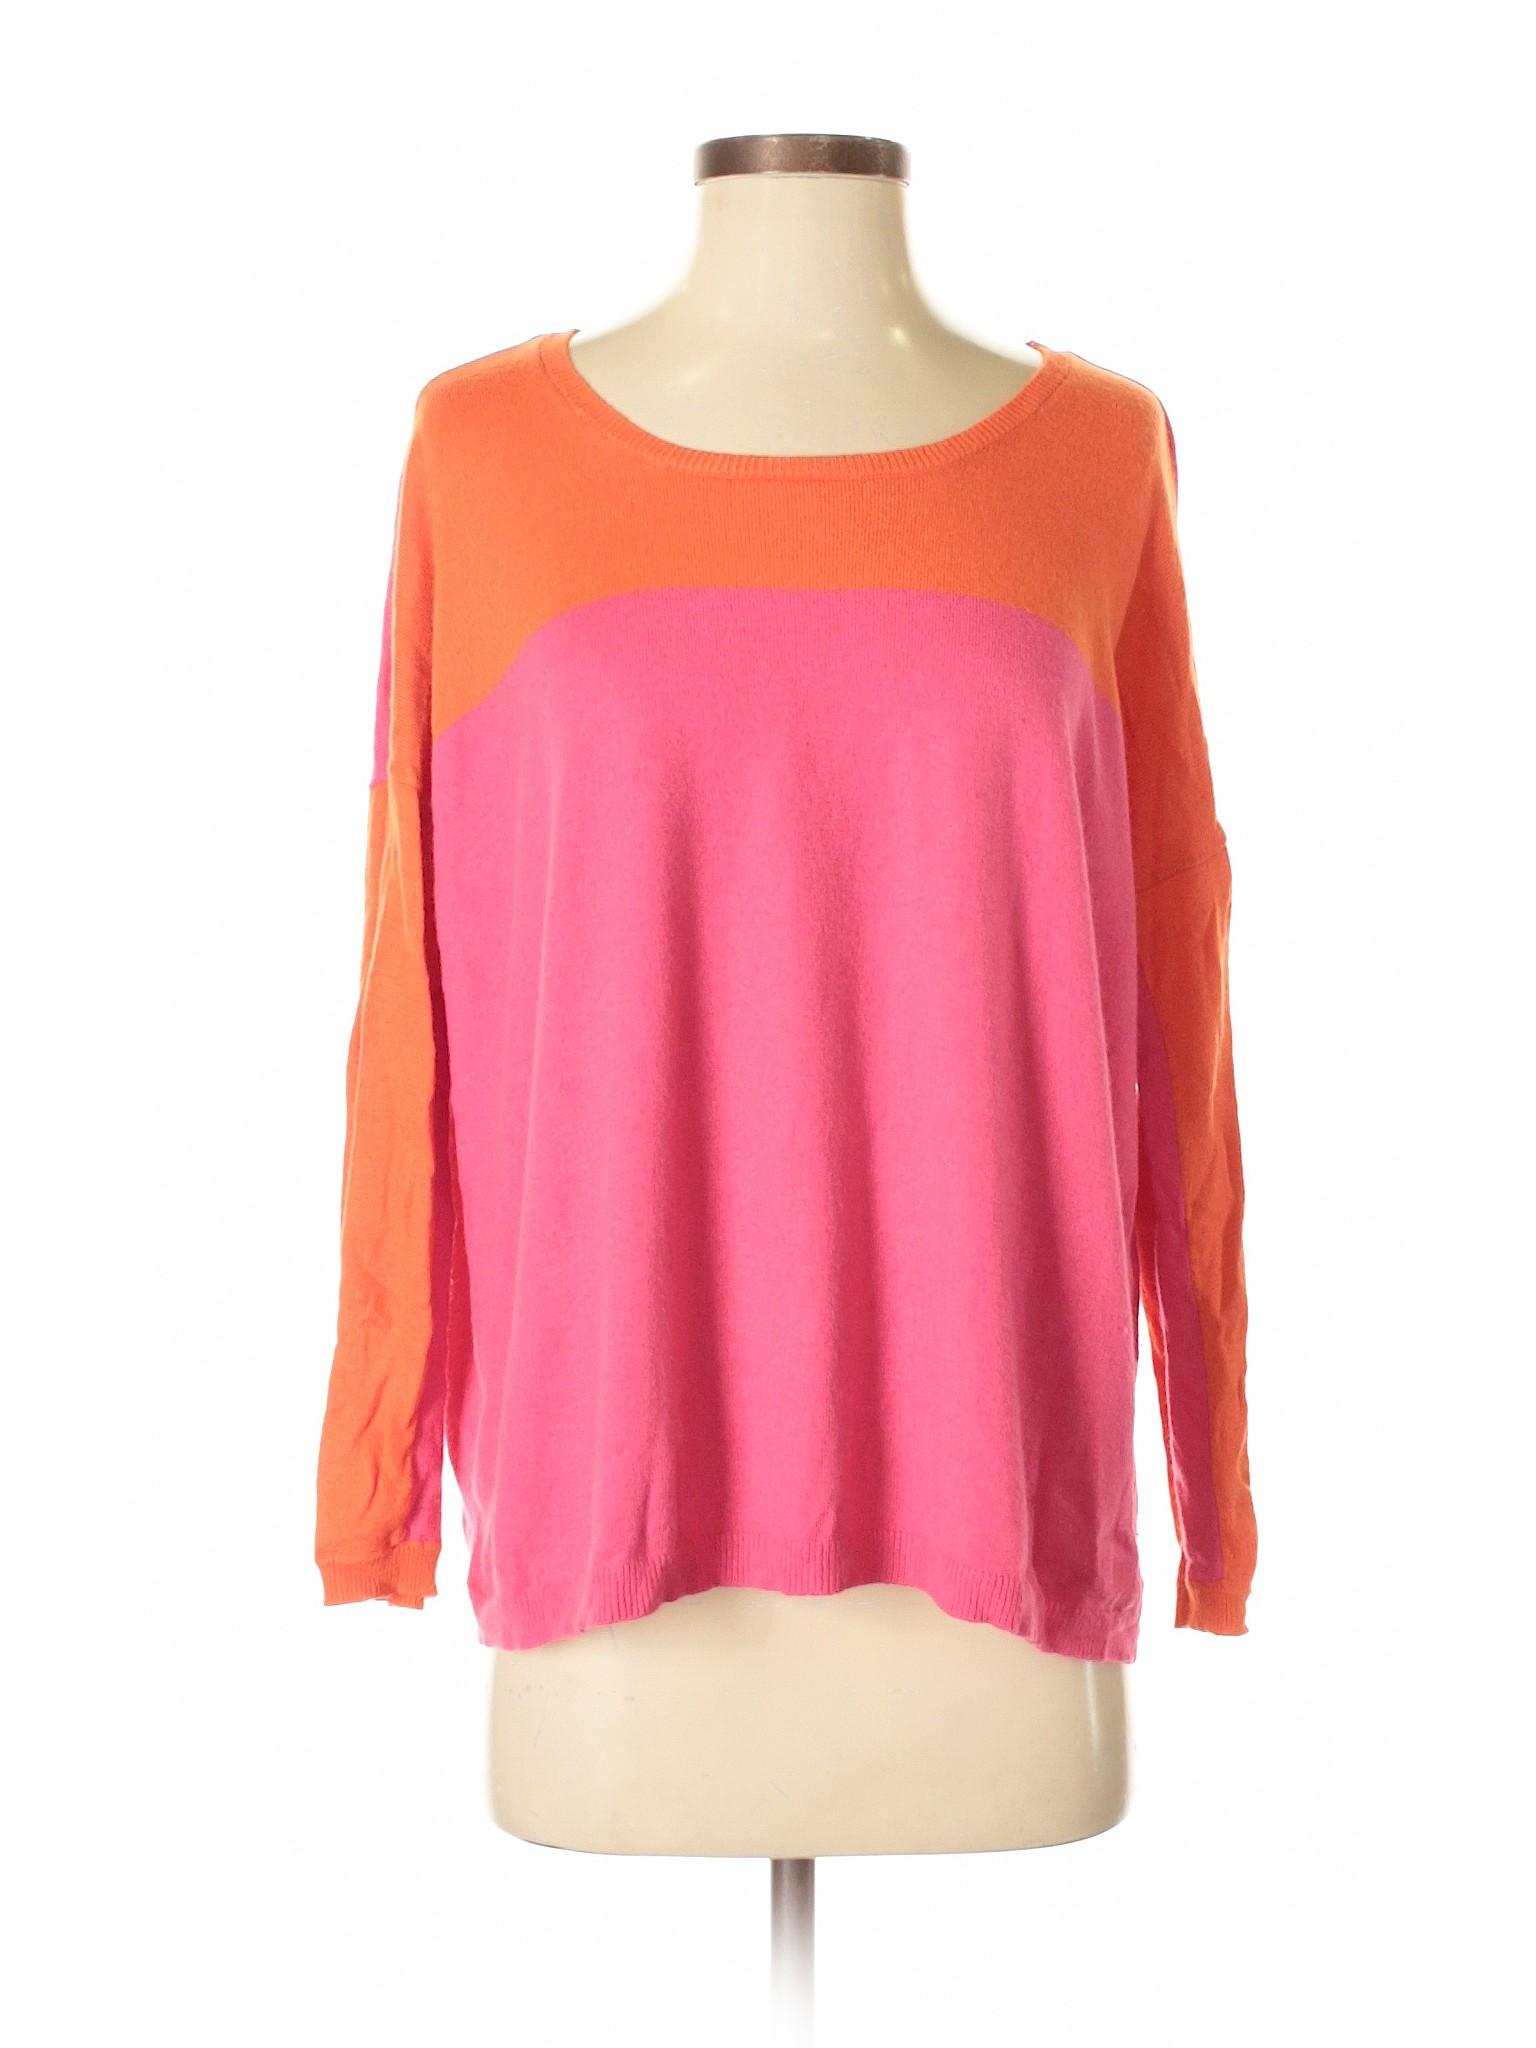 Pullover Boutique Pullover Pullover Boutique Payton Sweater Boutique Payton Payton Sweater Sweater Boutique Payton Pgnq1wU